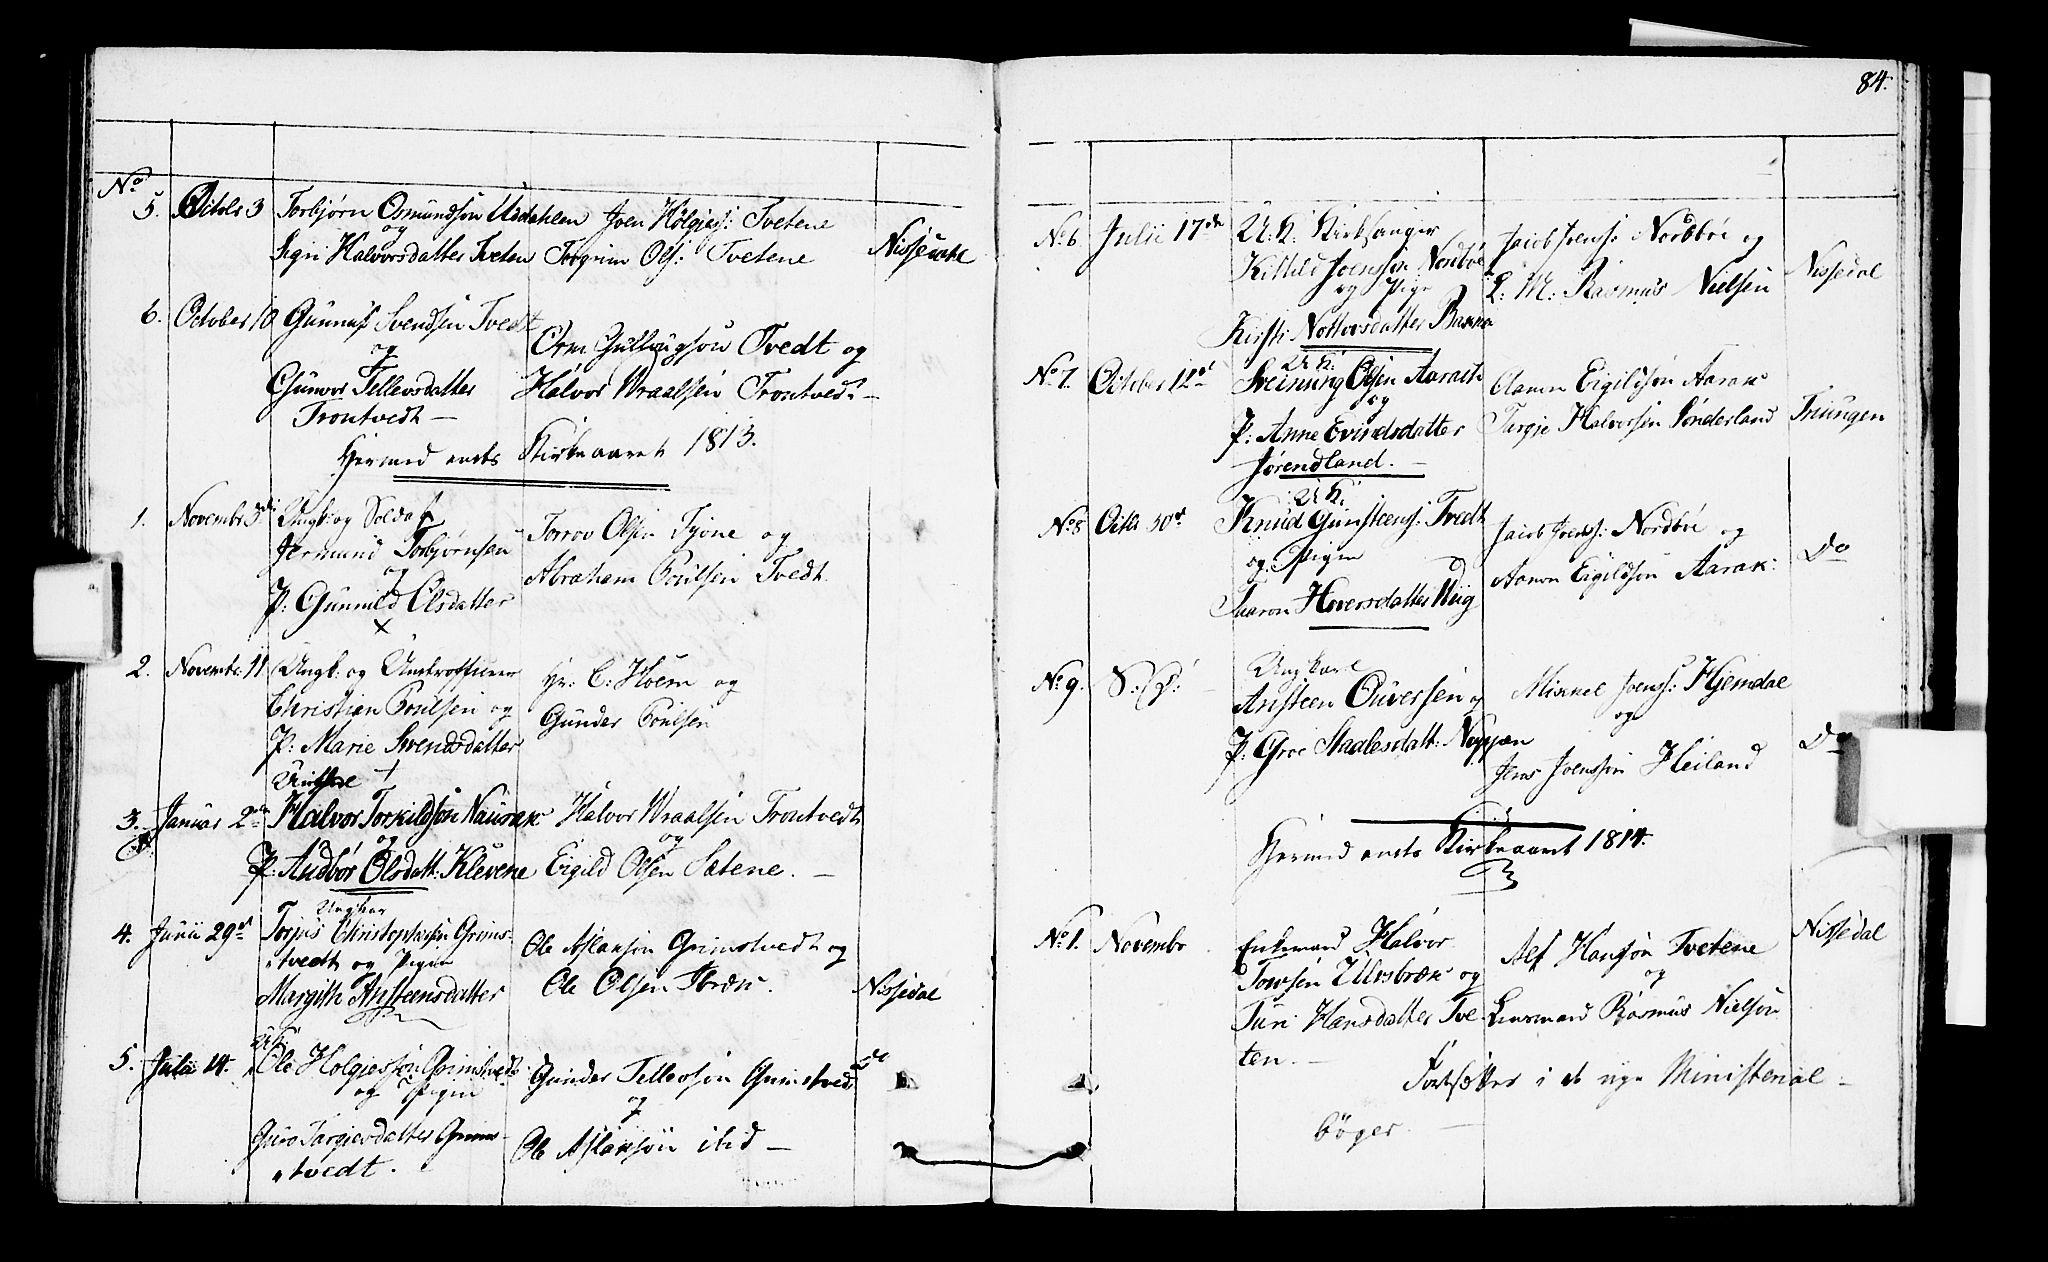 SAKO, Nissedal kirkebøker, F/Fa/L0001: Ministerialbok nr. I 1, 1811-1814, s. 84